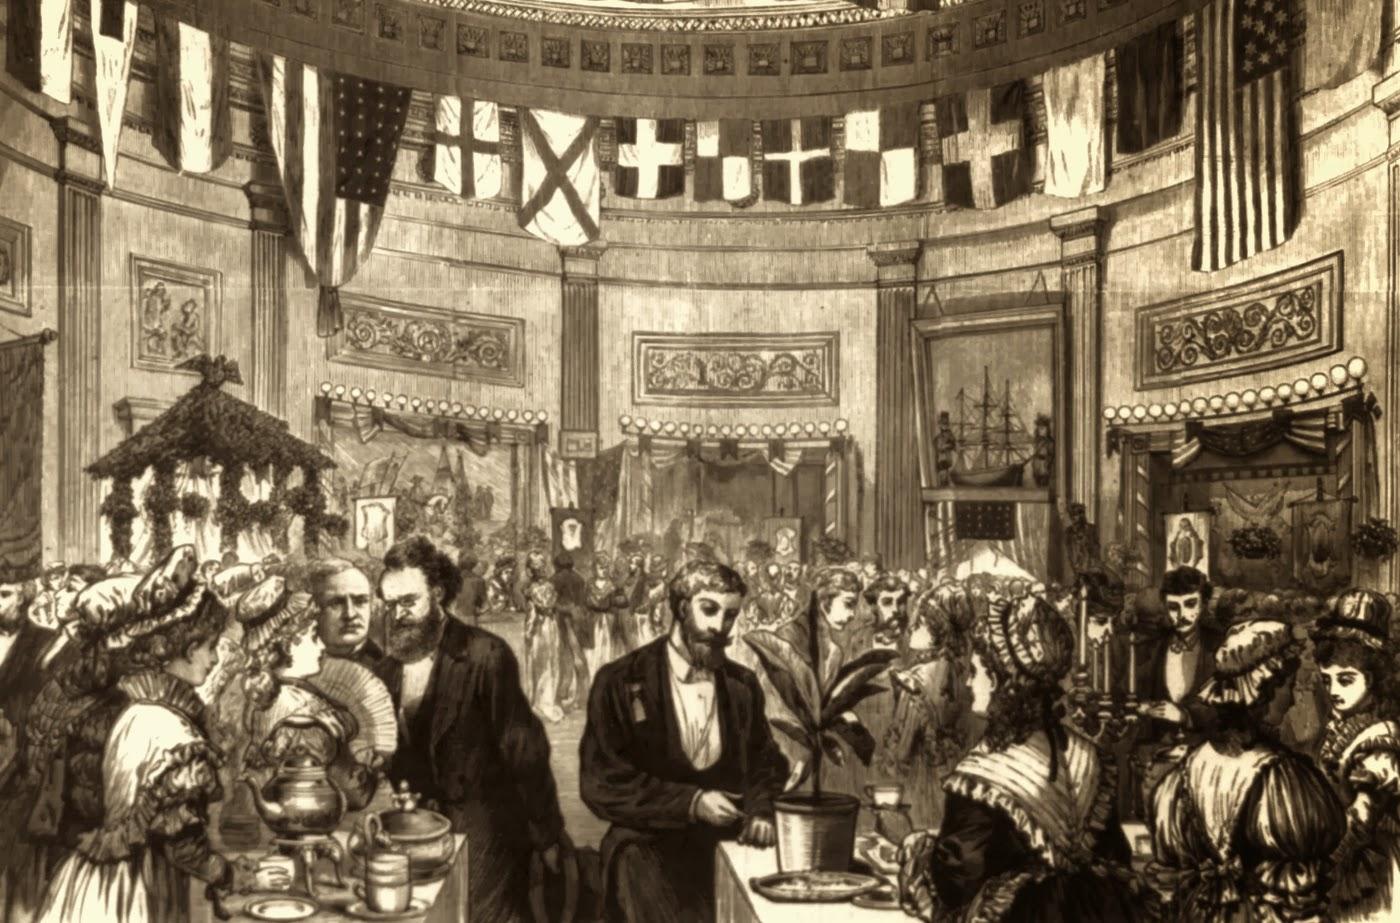 Etiquette victorian women What to